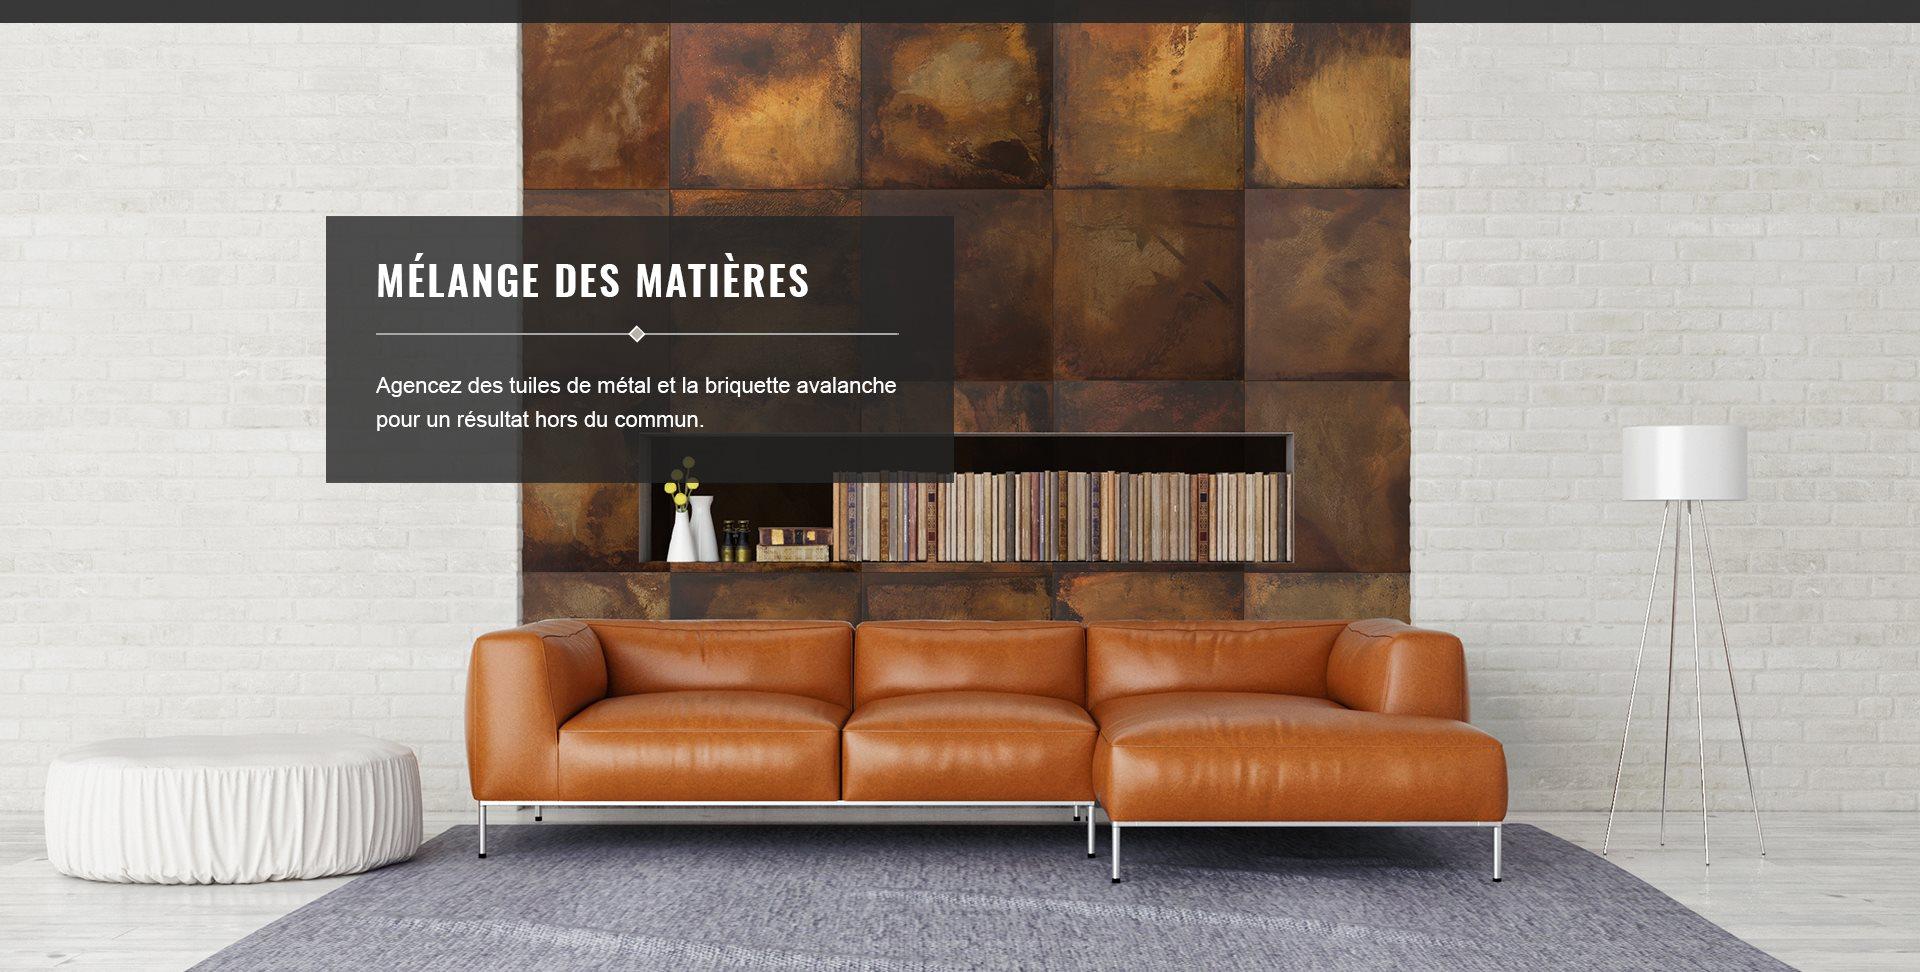 5-Melange-des-matiere-FR